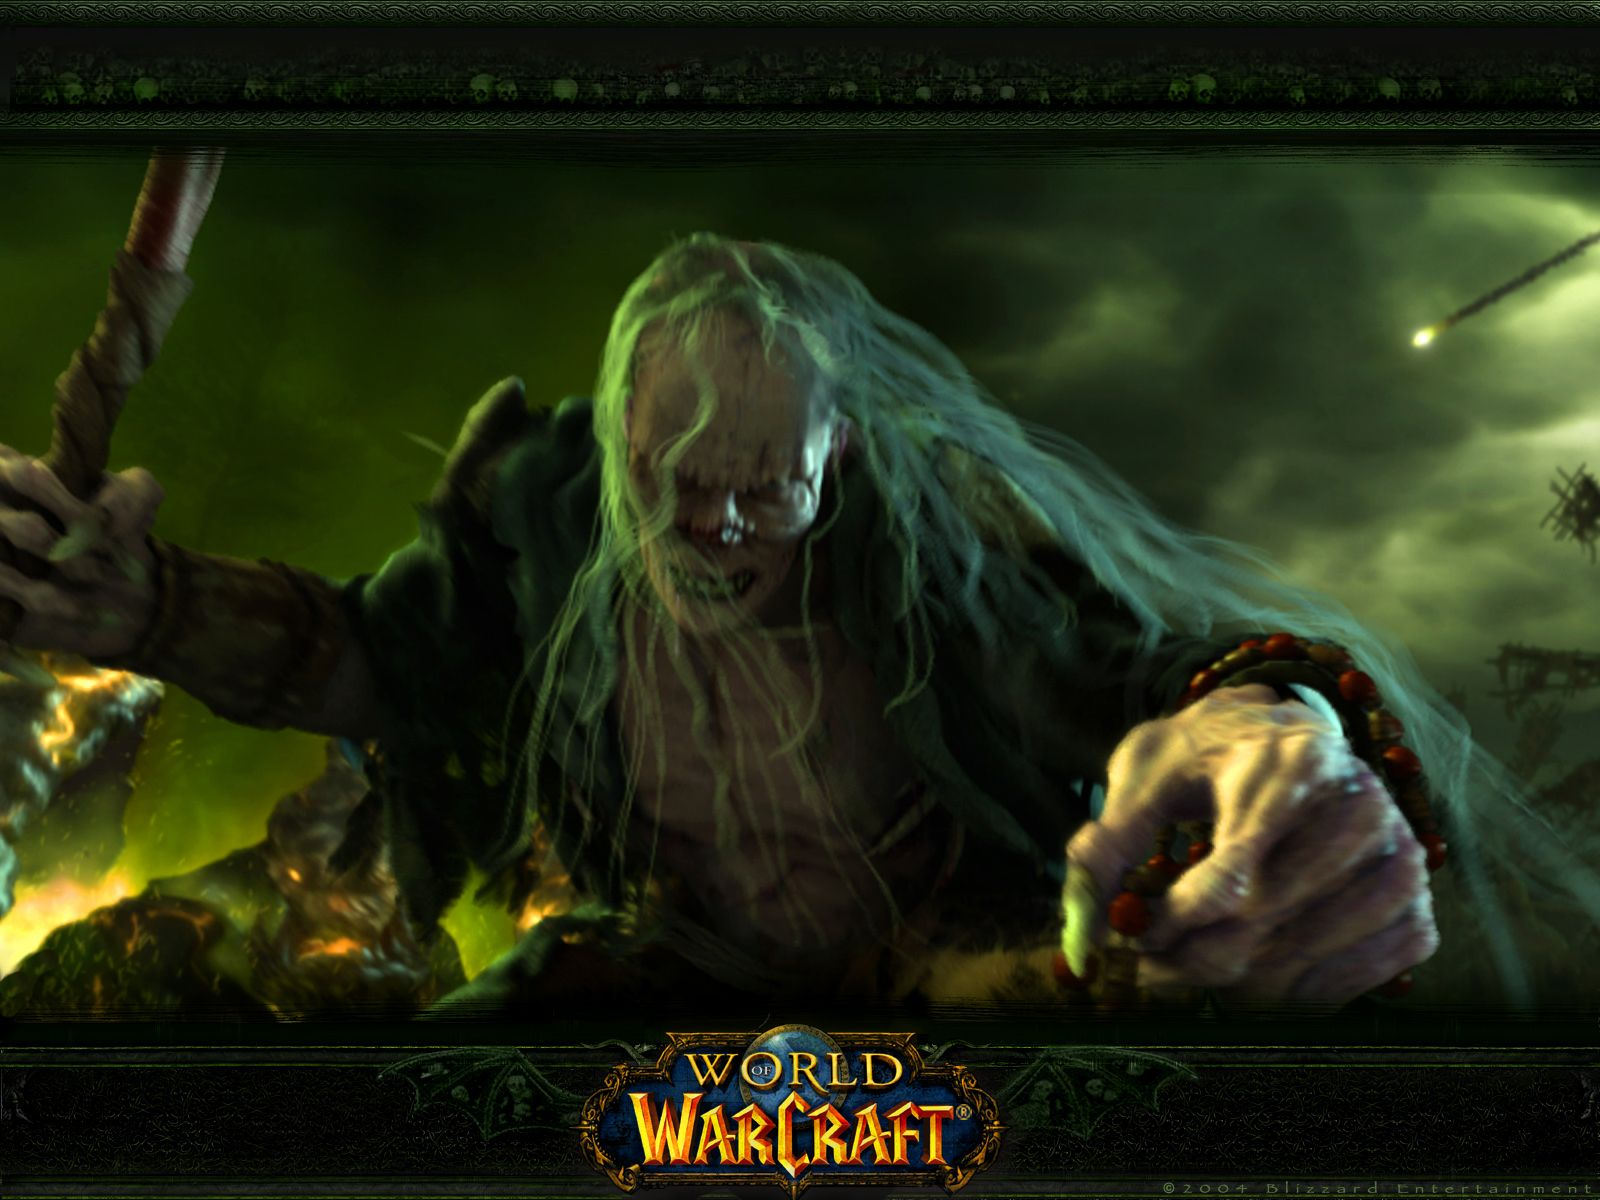 World Of Warcraft Night Elf Druid Wallpaper World Of Warcraft